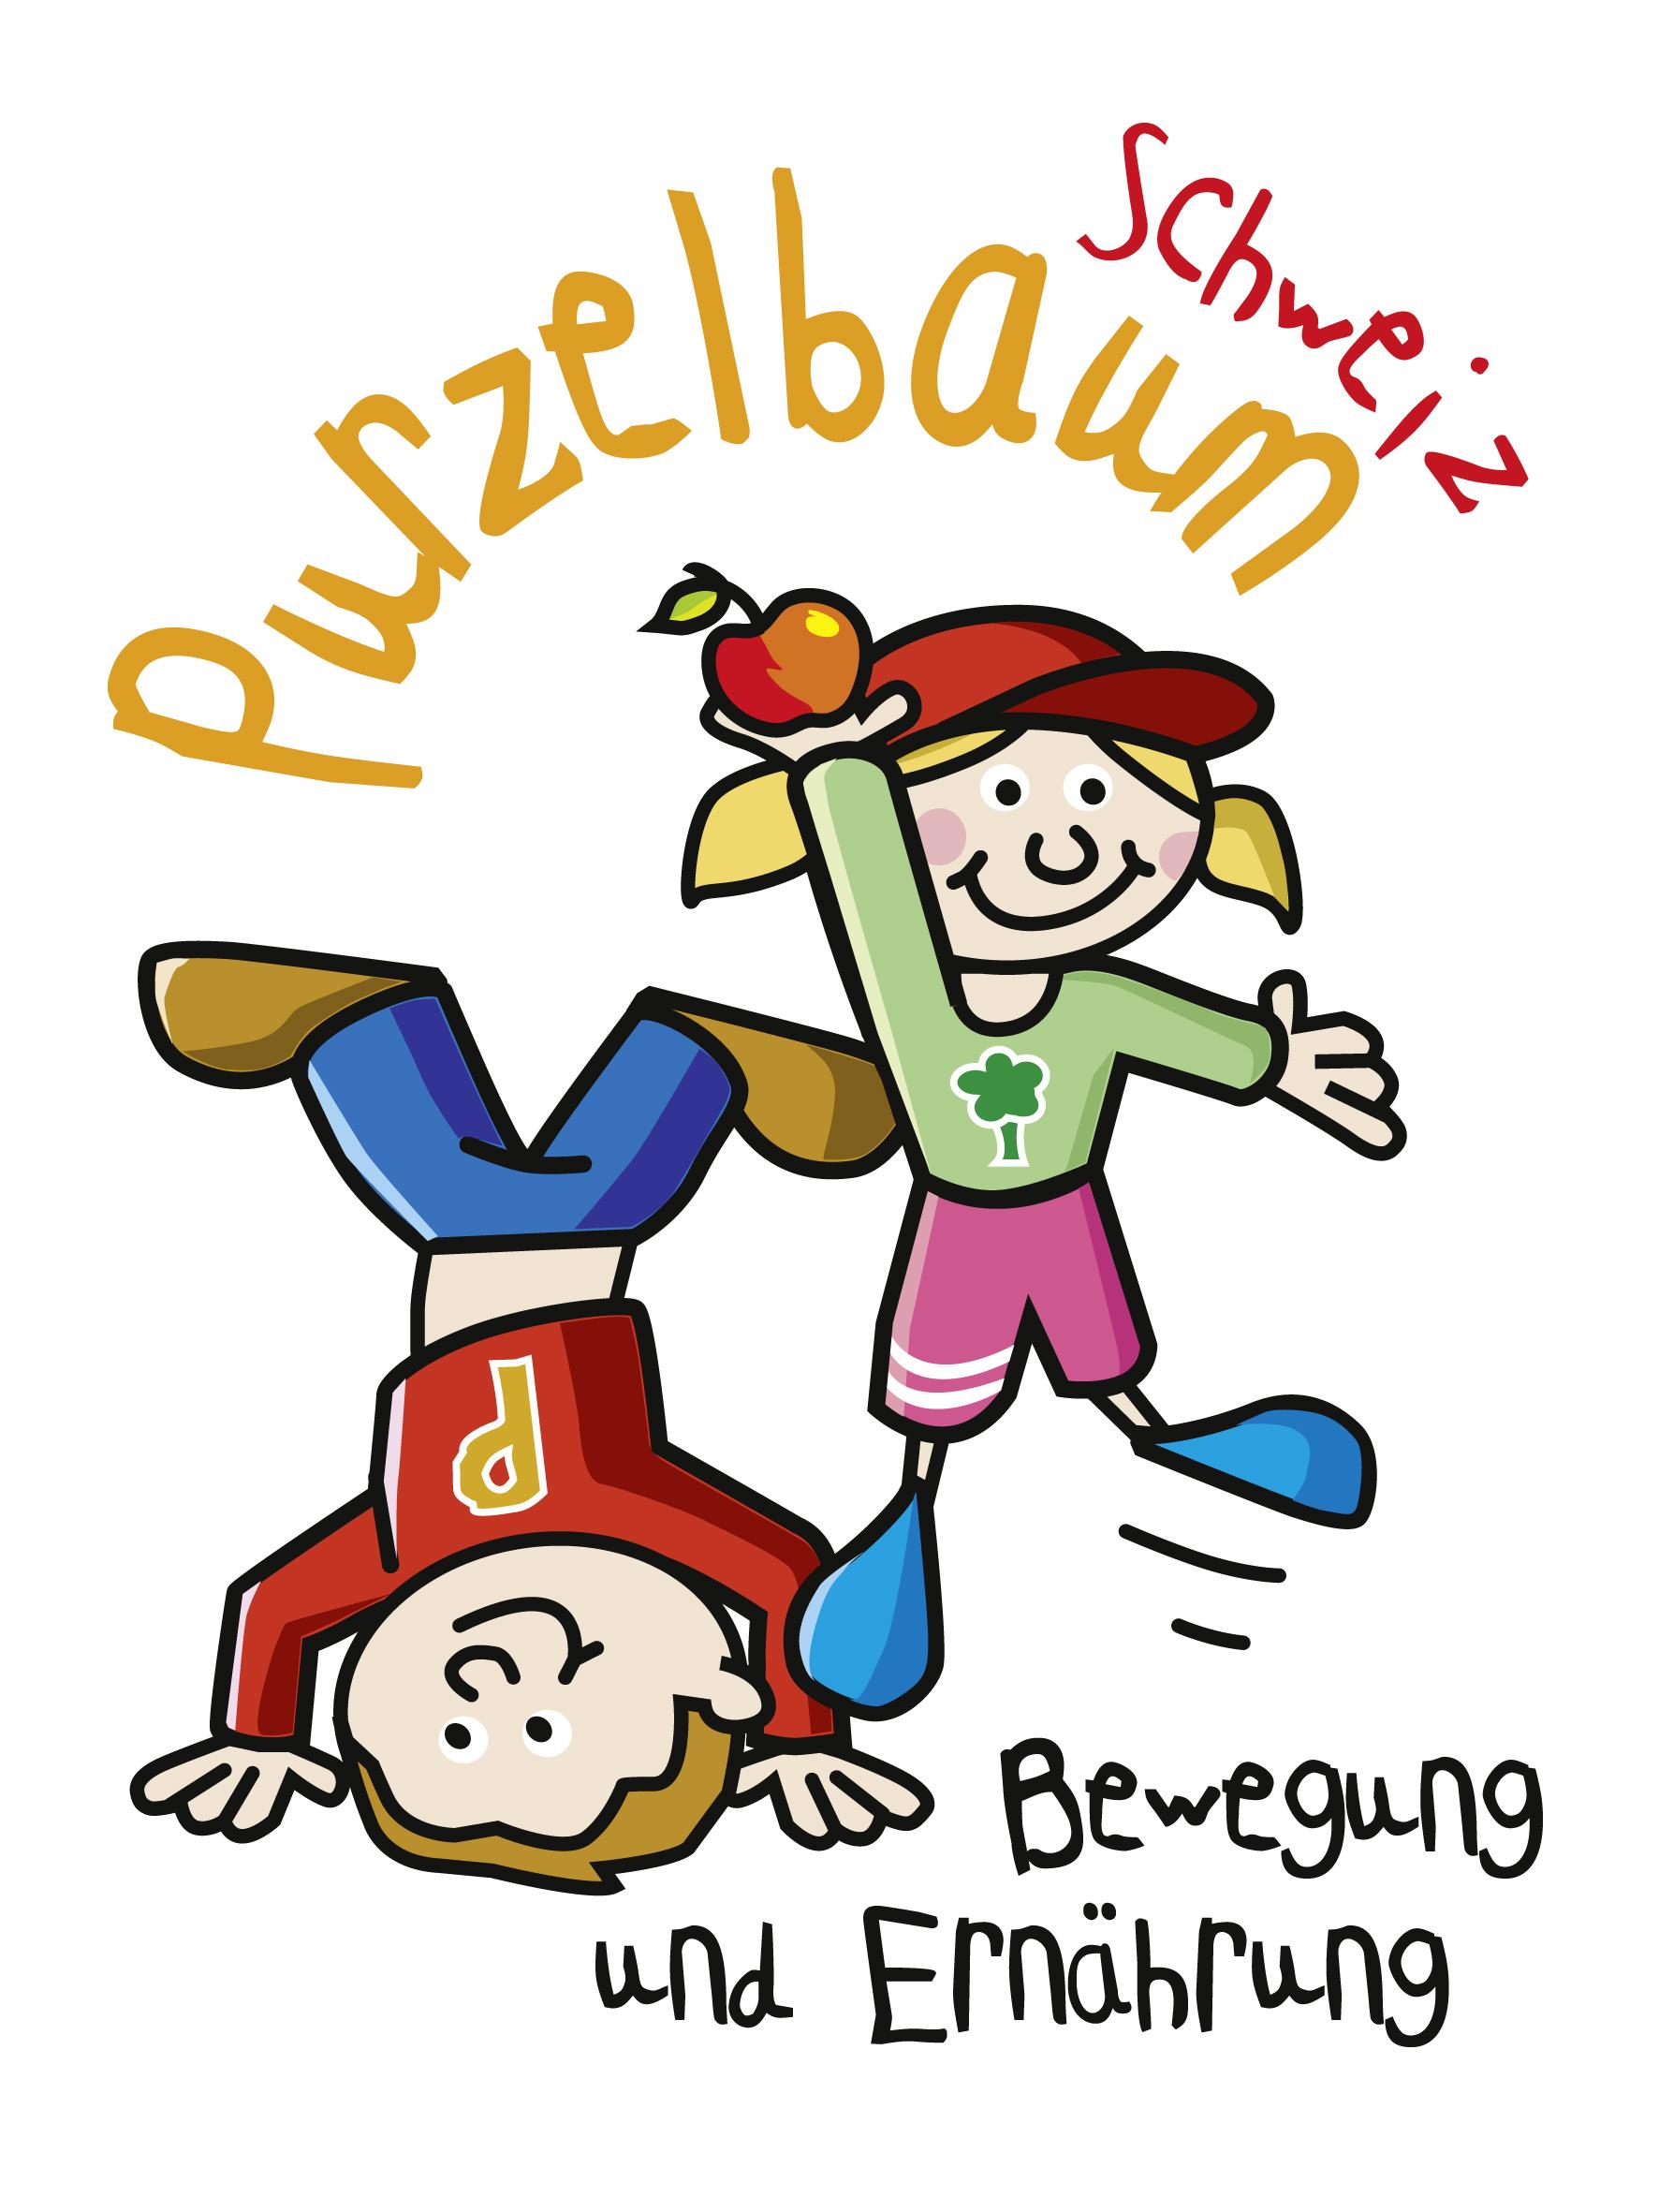 logo purzelbaum schweiz